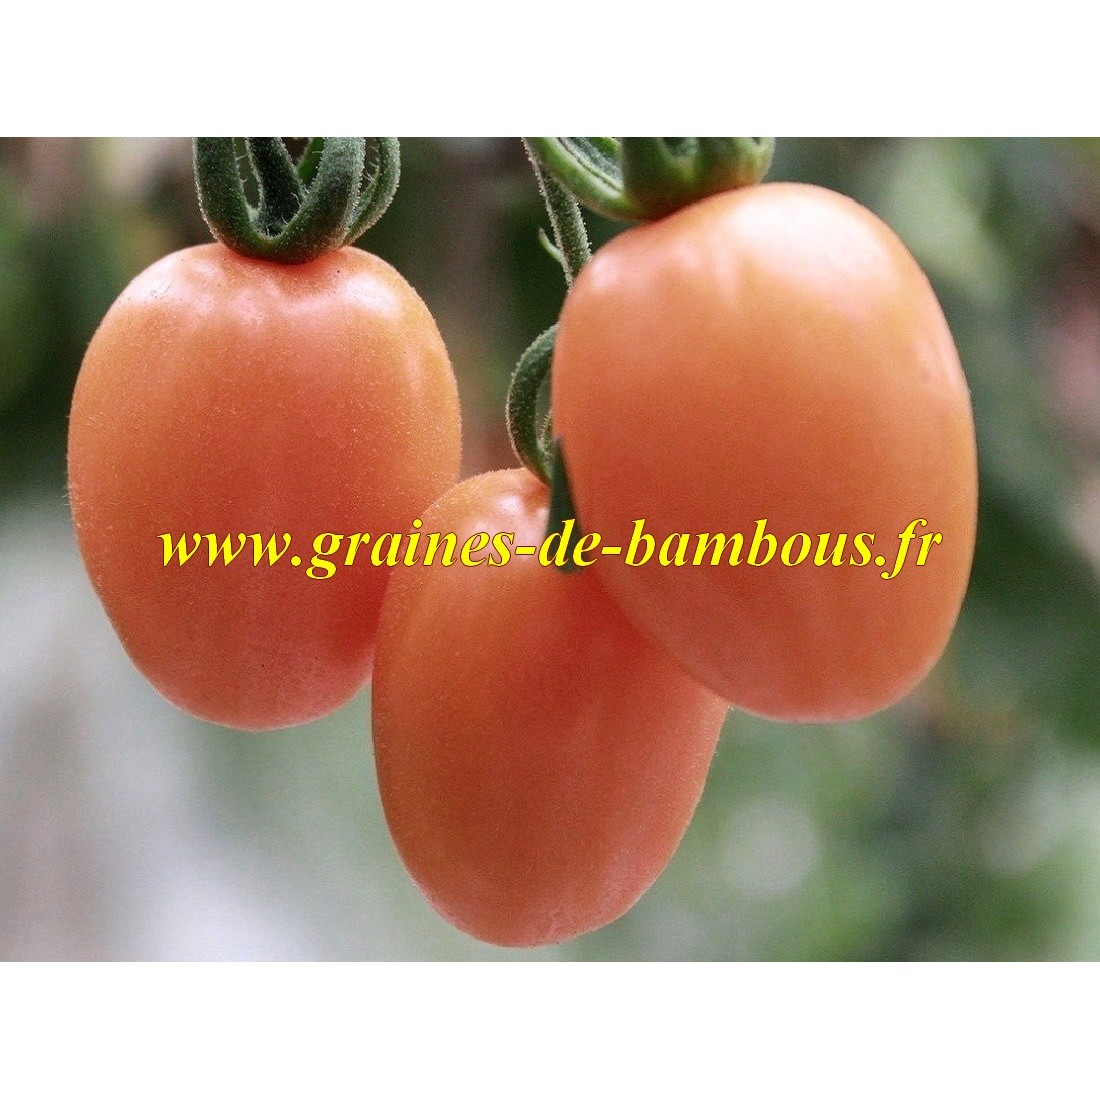 Tomate pink thai rose graines de bambous eu